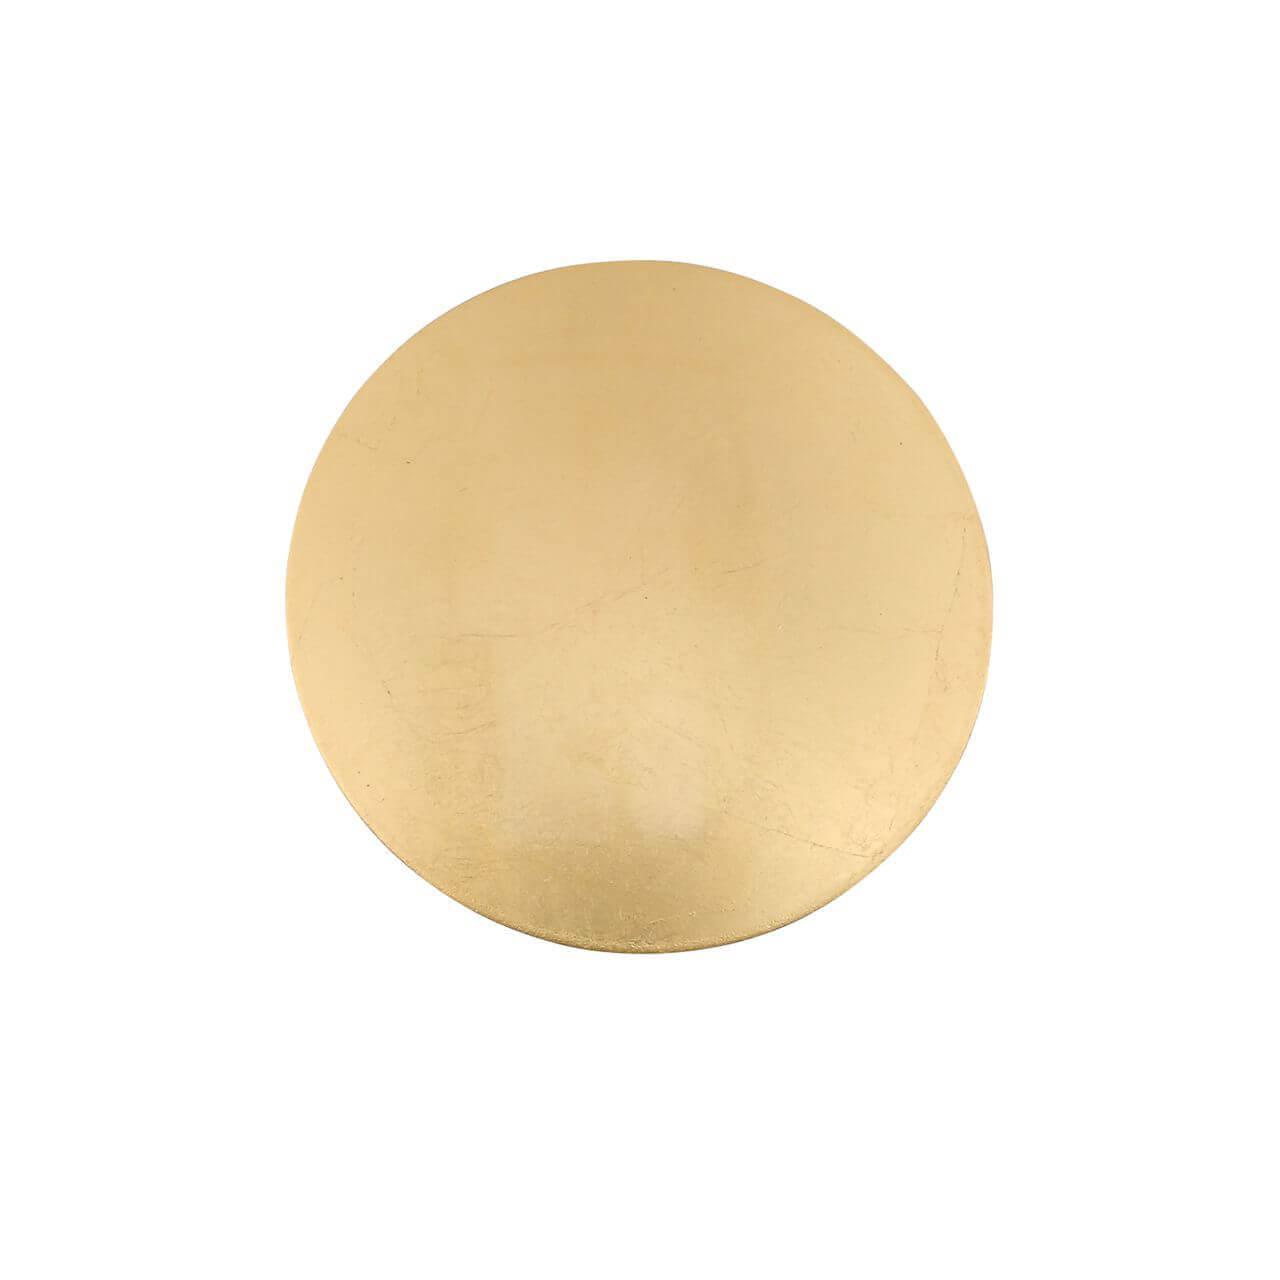 Светильник ST Luce SL457.201.01 Aureo светильник st luce sl828 502 12 camomilla